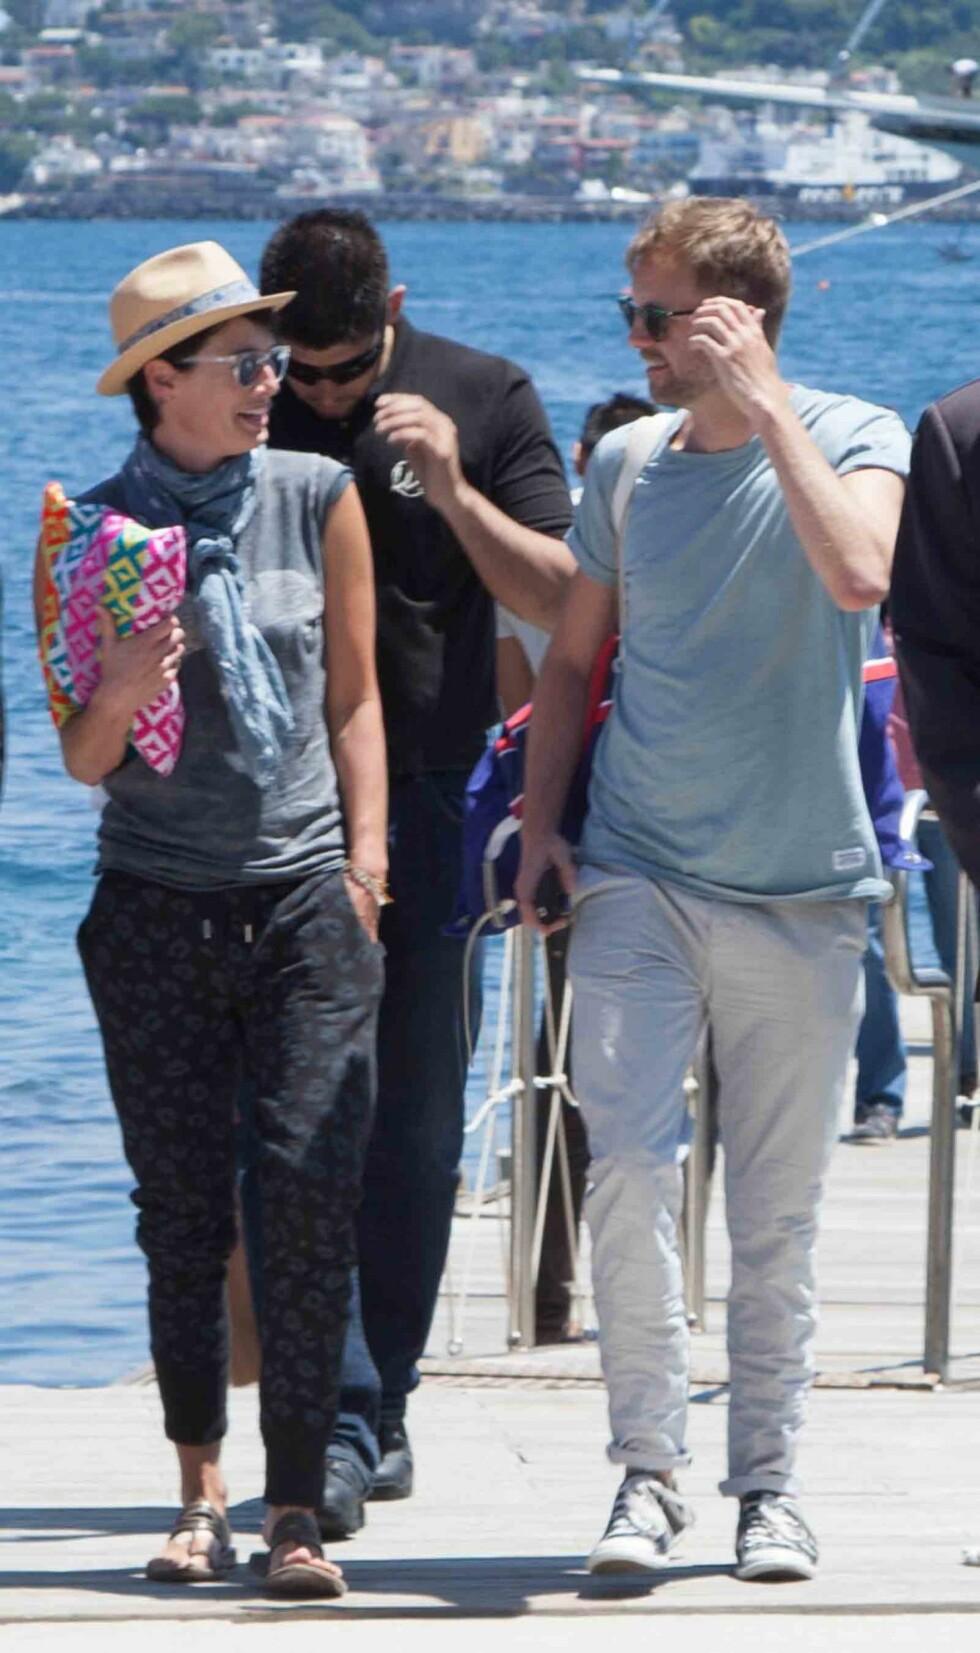 TOSPANN: Tv-stjernen og kameraten ankom festivalen på den italienske øya sammen, ifølge All Over Press. Her spaserer de sammen i solskinnet tirsdag. Foto: Fotonews/Splash News/All Over Press